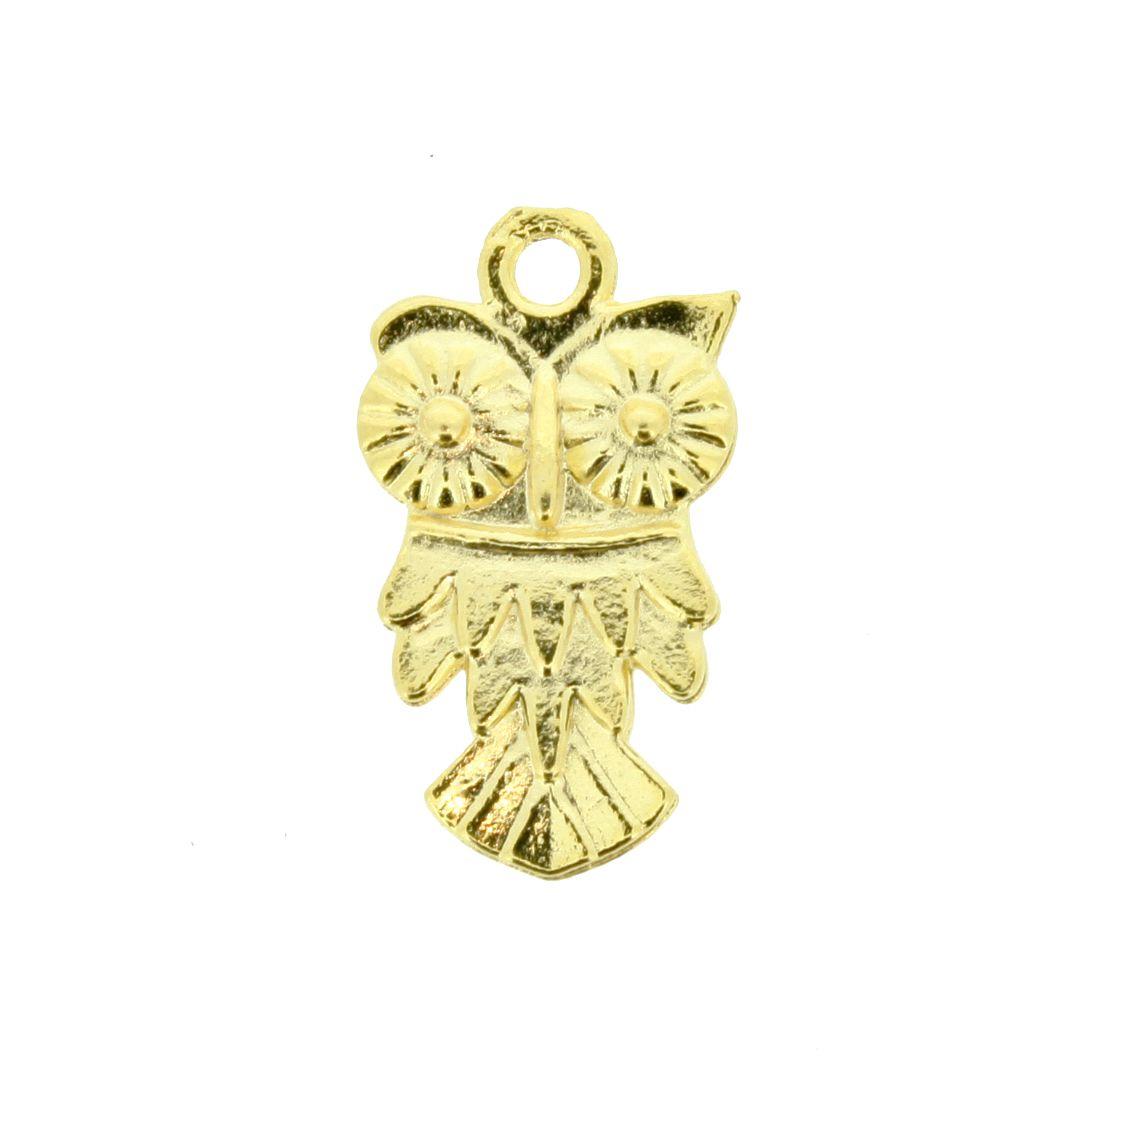 Coruja - Dourado - 19mm  - Stéphanie Bijoux® - Peças para Bijuterias e Artesanato